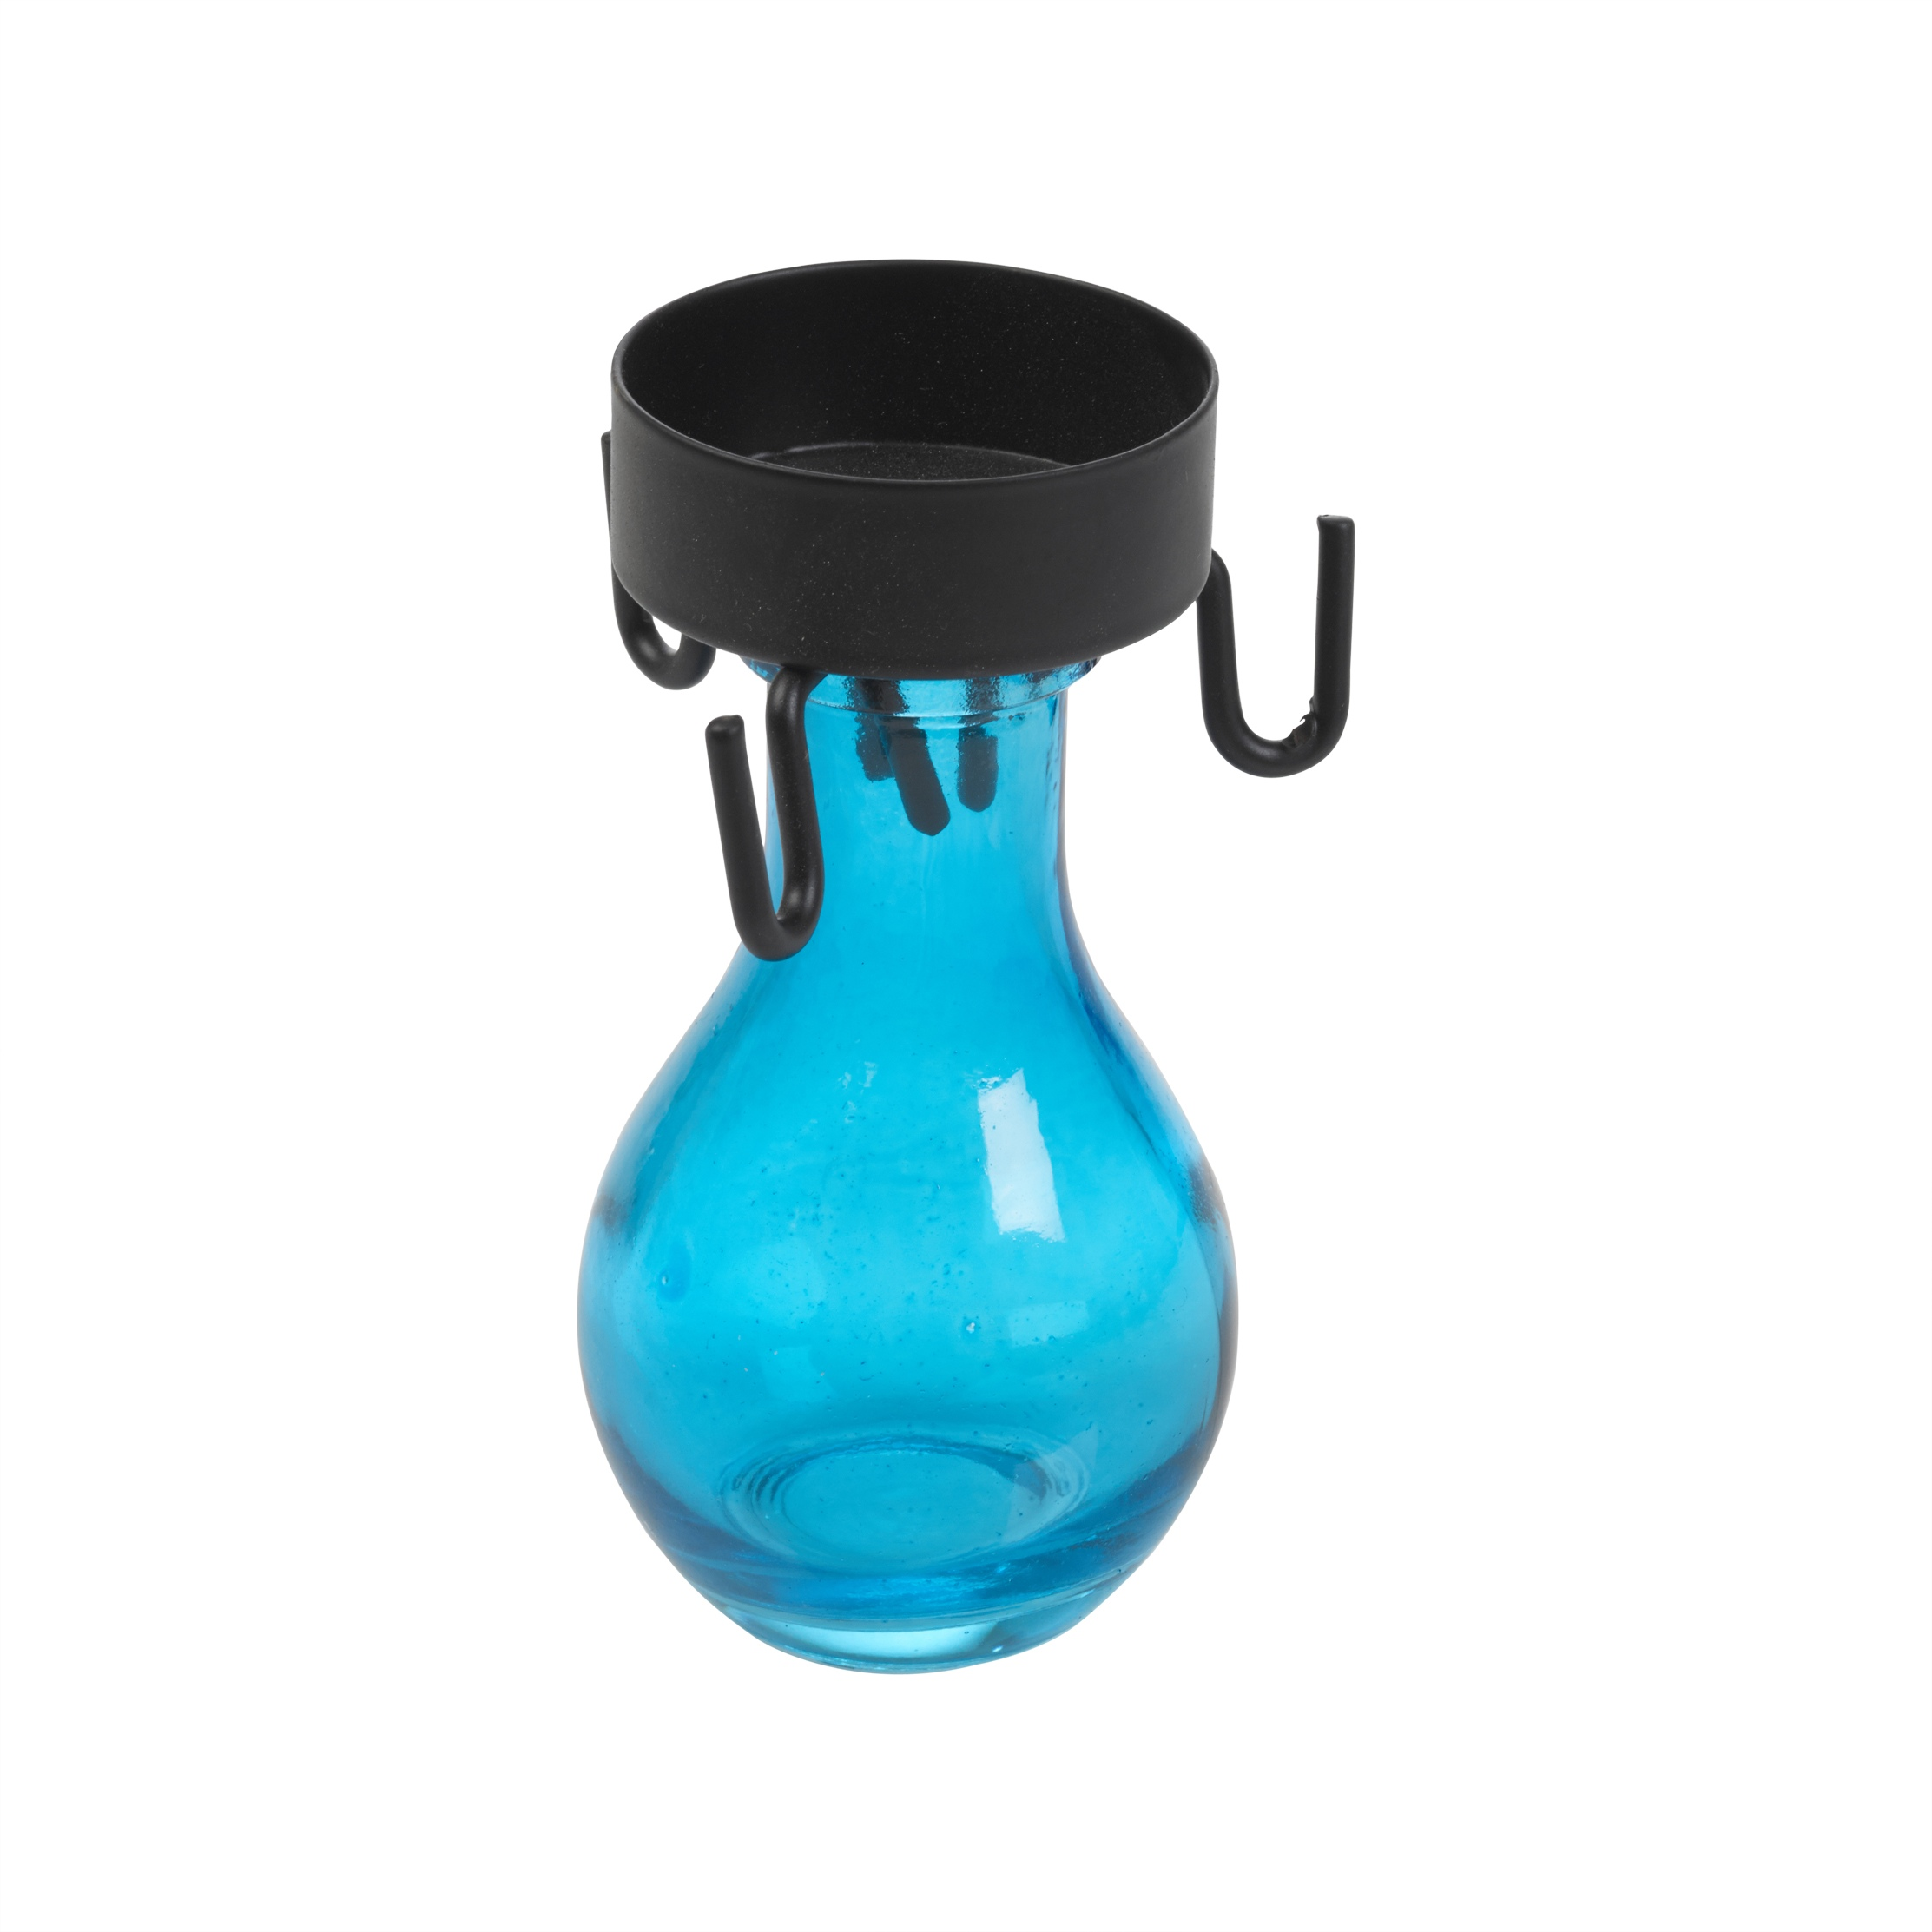 Frosted Glass Lamp Tea Light Holder Home Decor Tealight